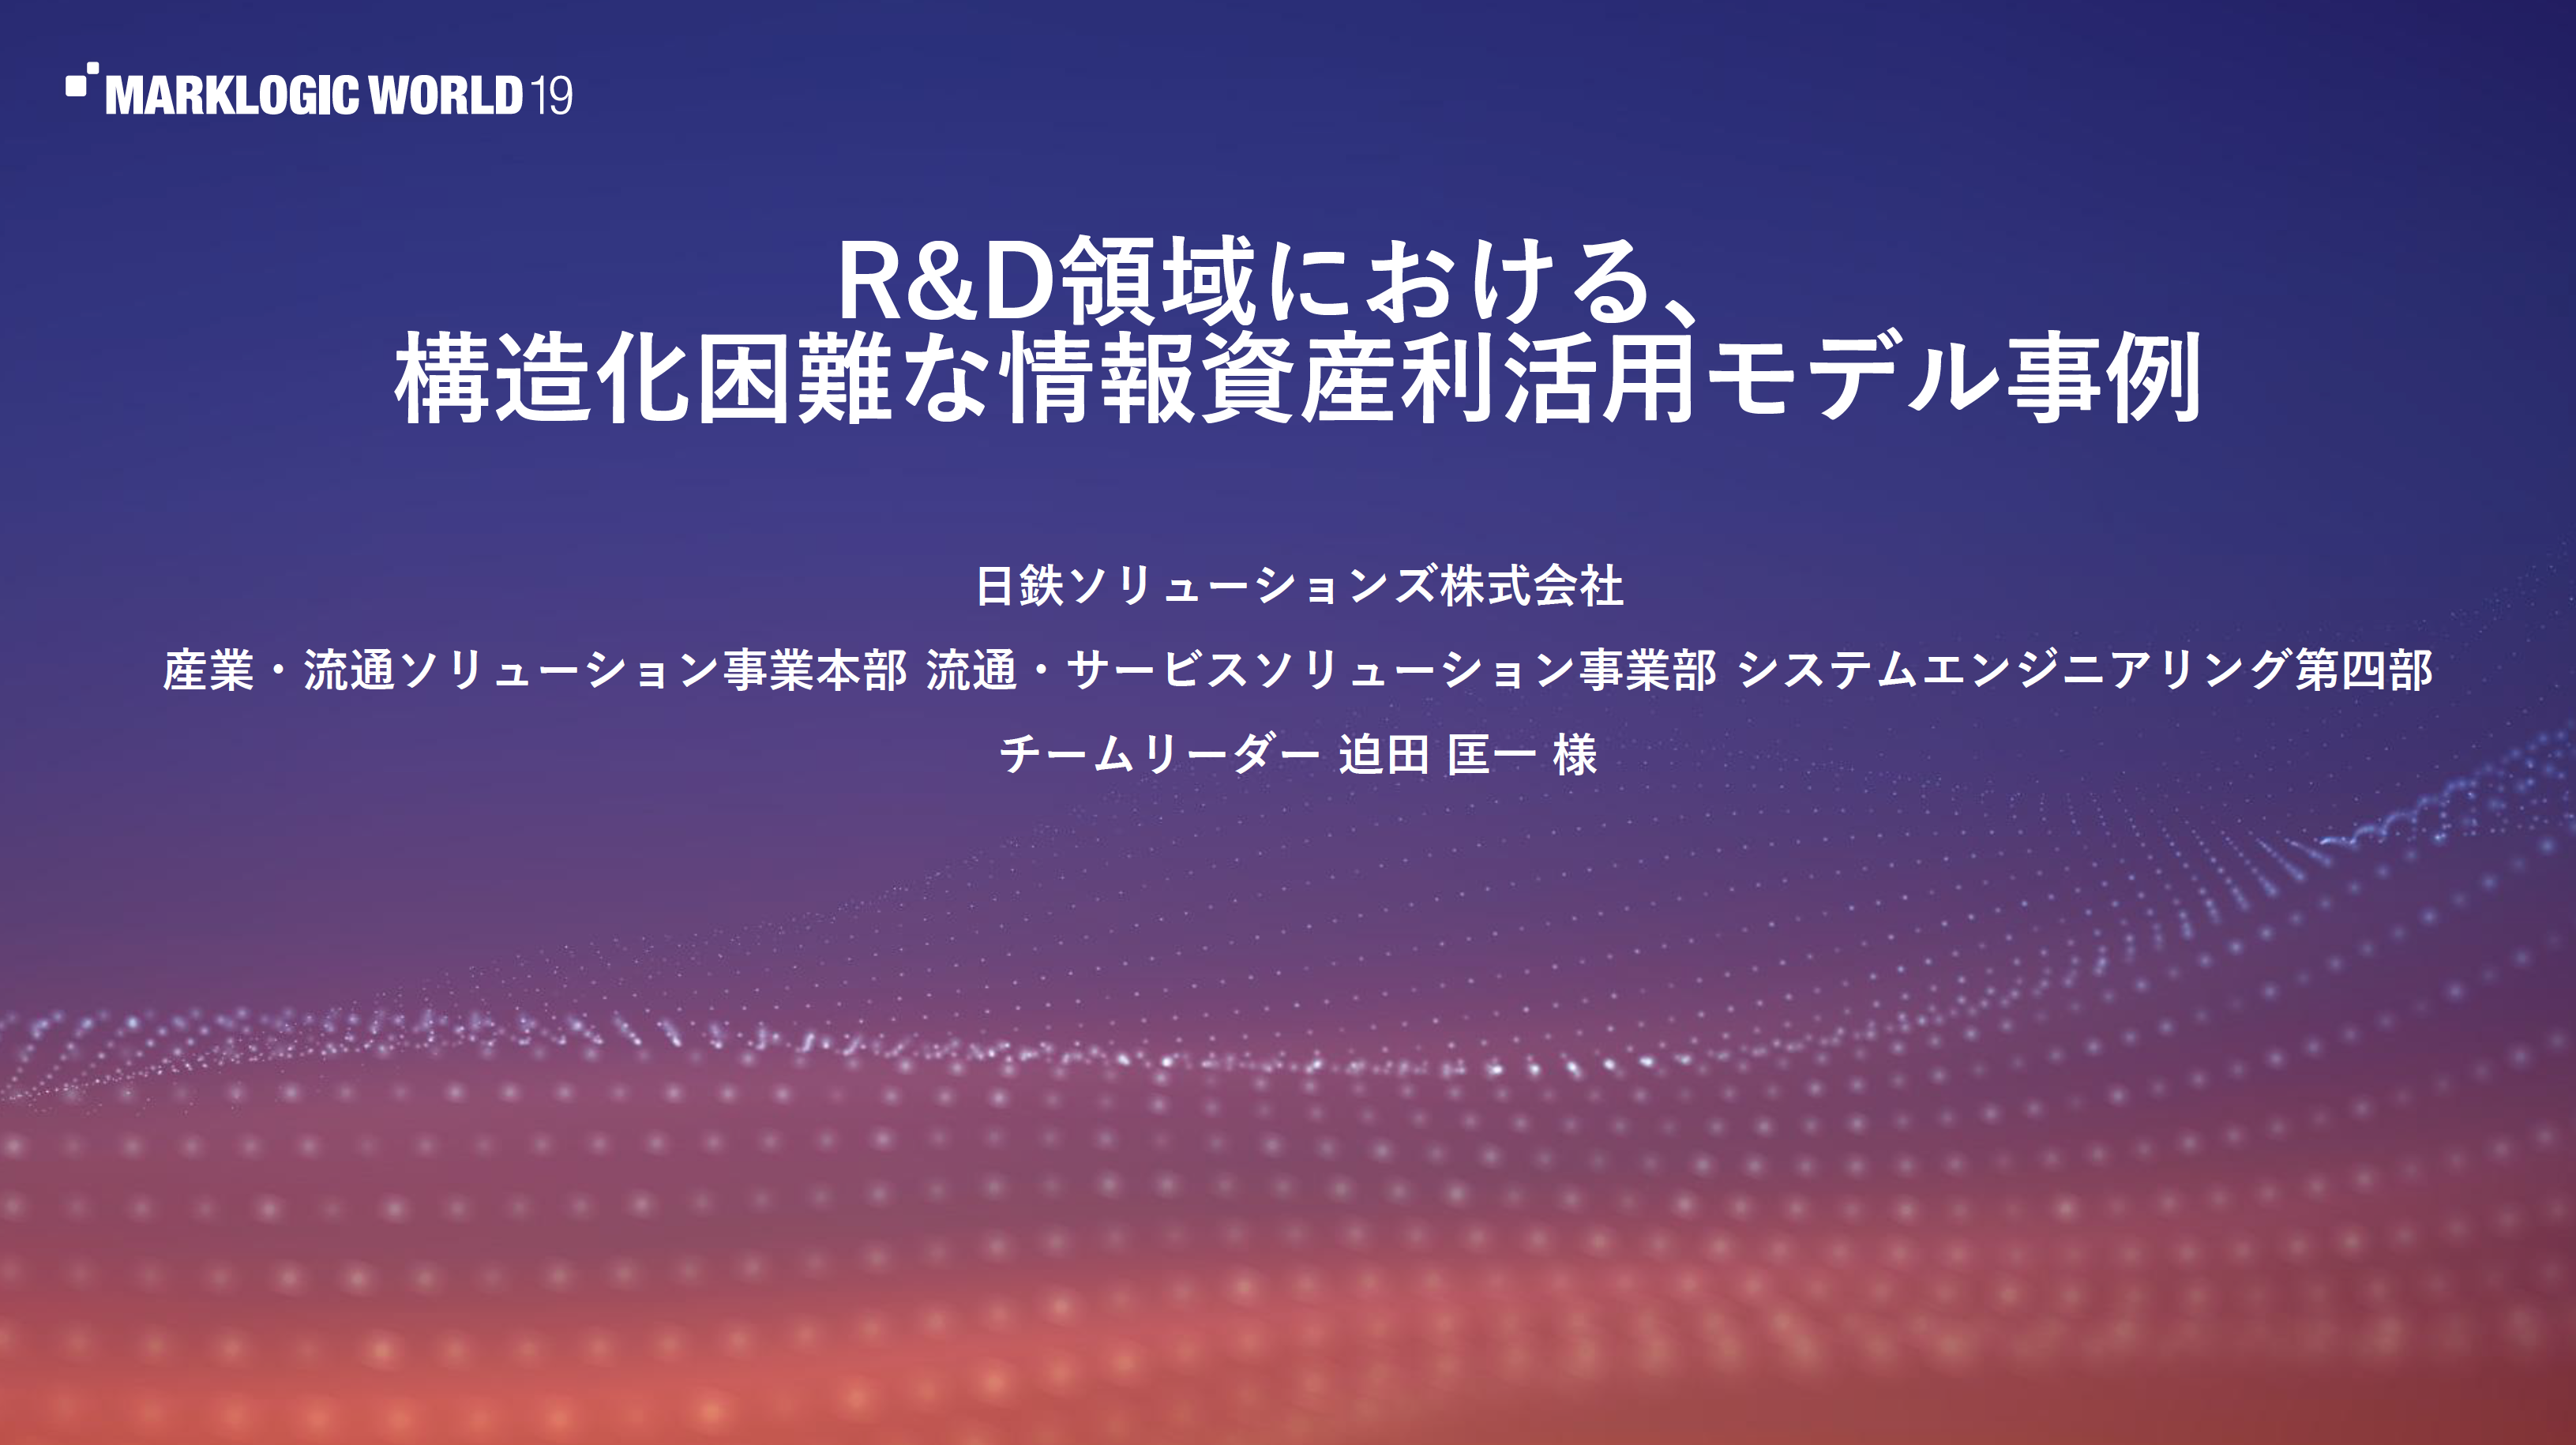 MarkLogic World Tokyo 2019「R&D領域における、構造化困難な情報資産利活用モデル事例」